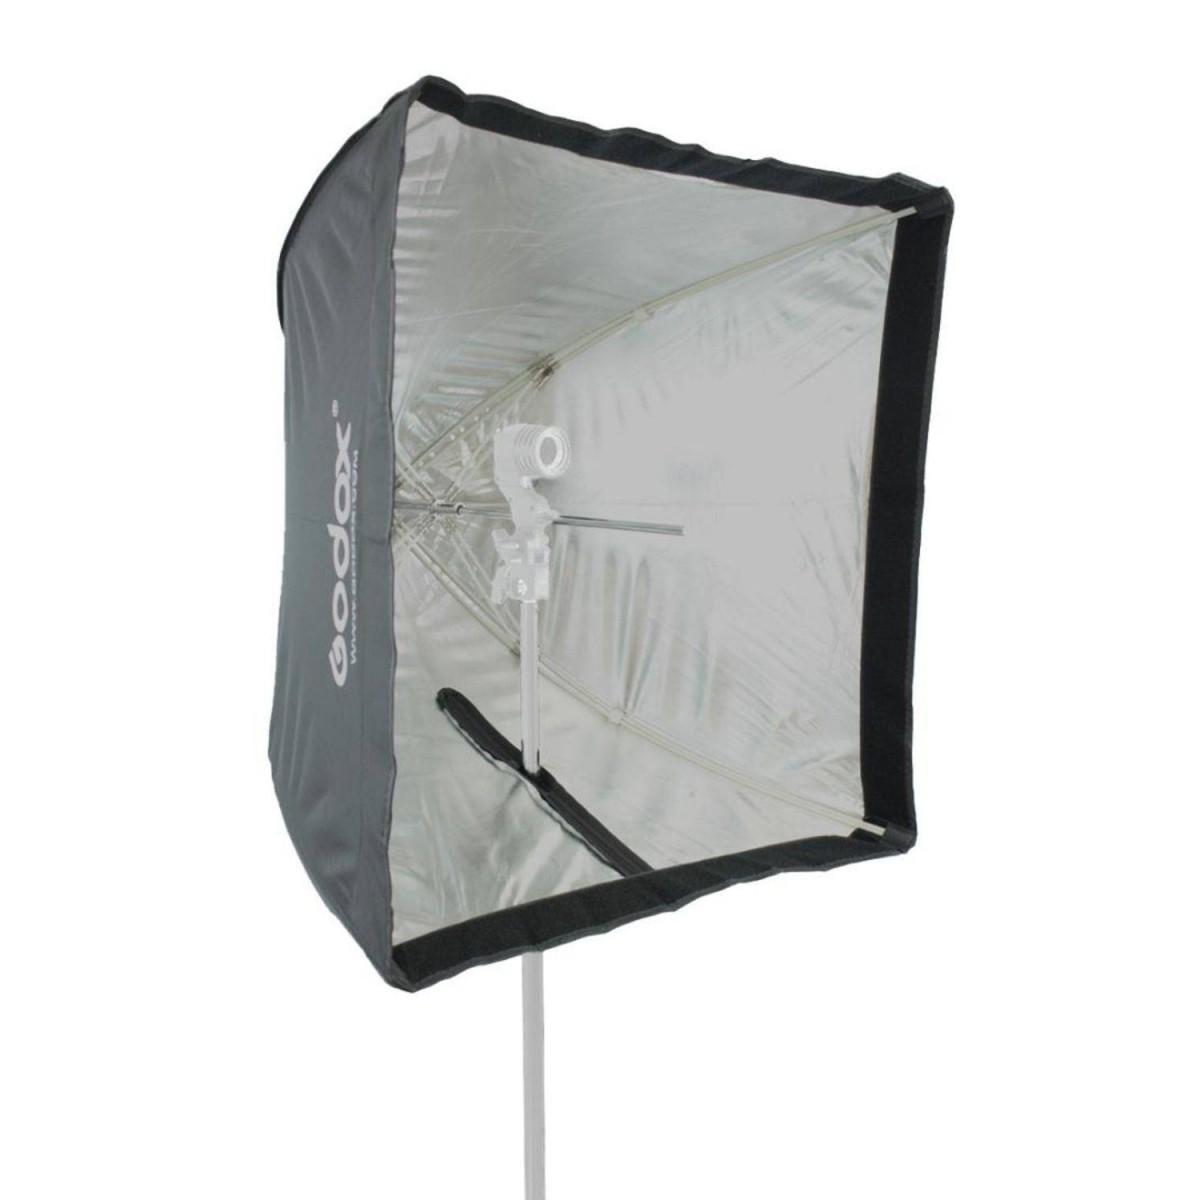 Softbox 60x60 Universal Para Flash Tocha E Luz Continua